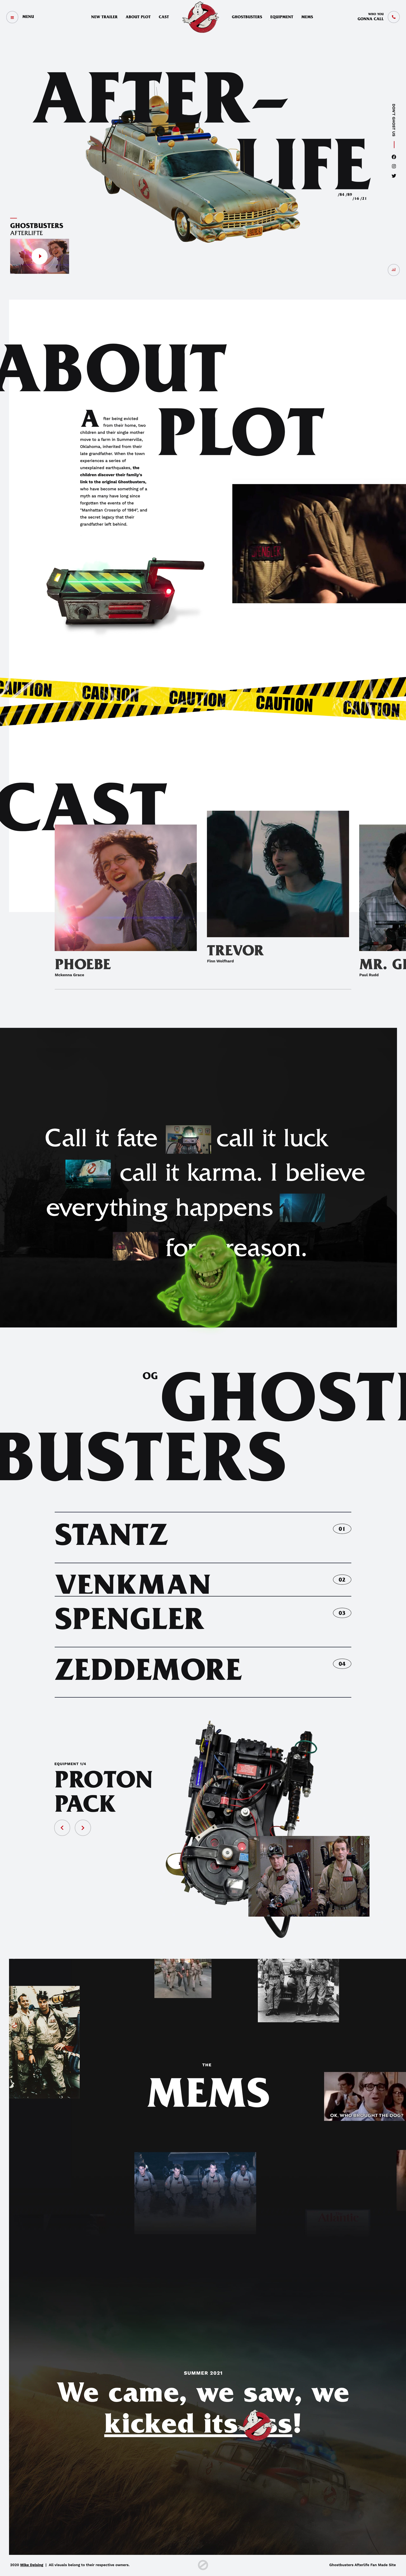 Ghostbusters Afterlife Website Screenshot